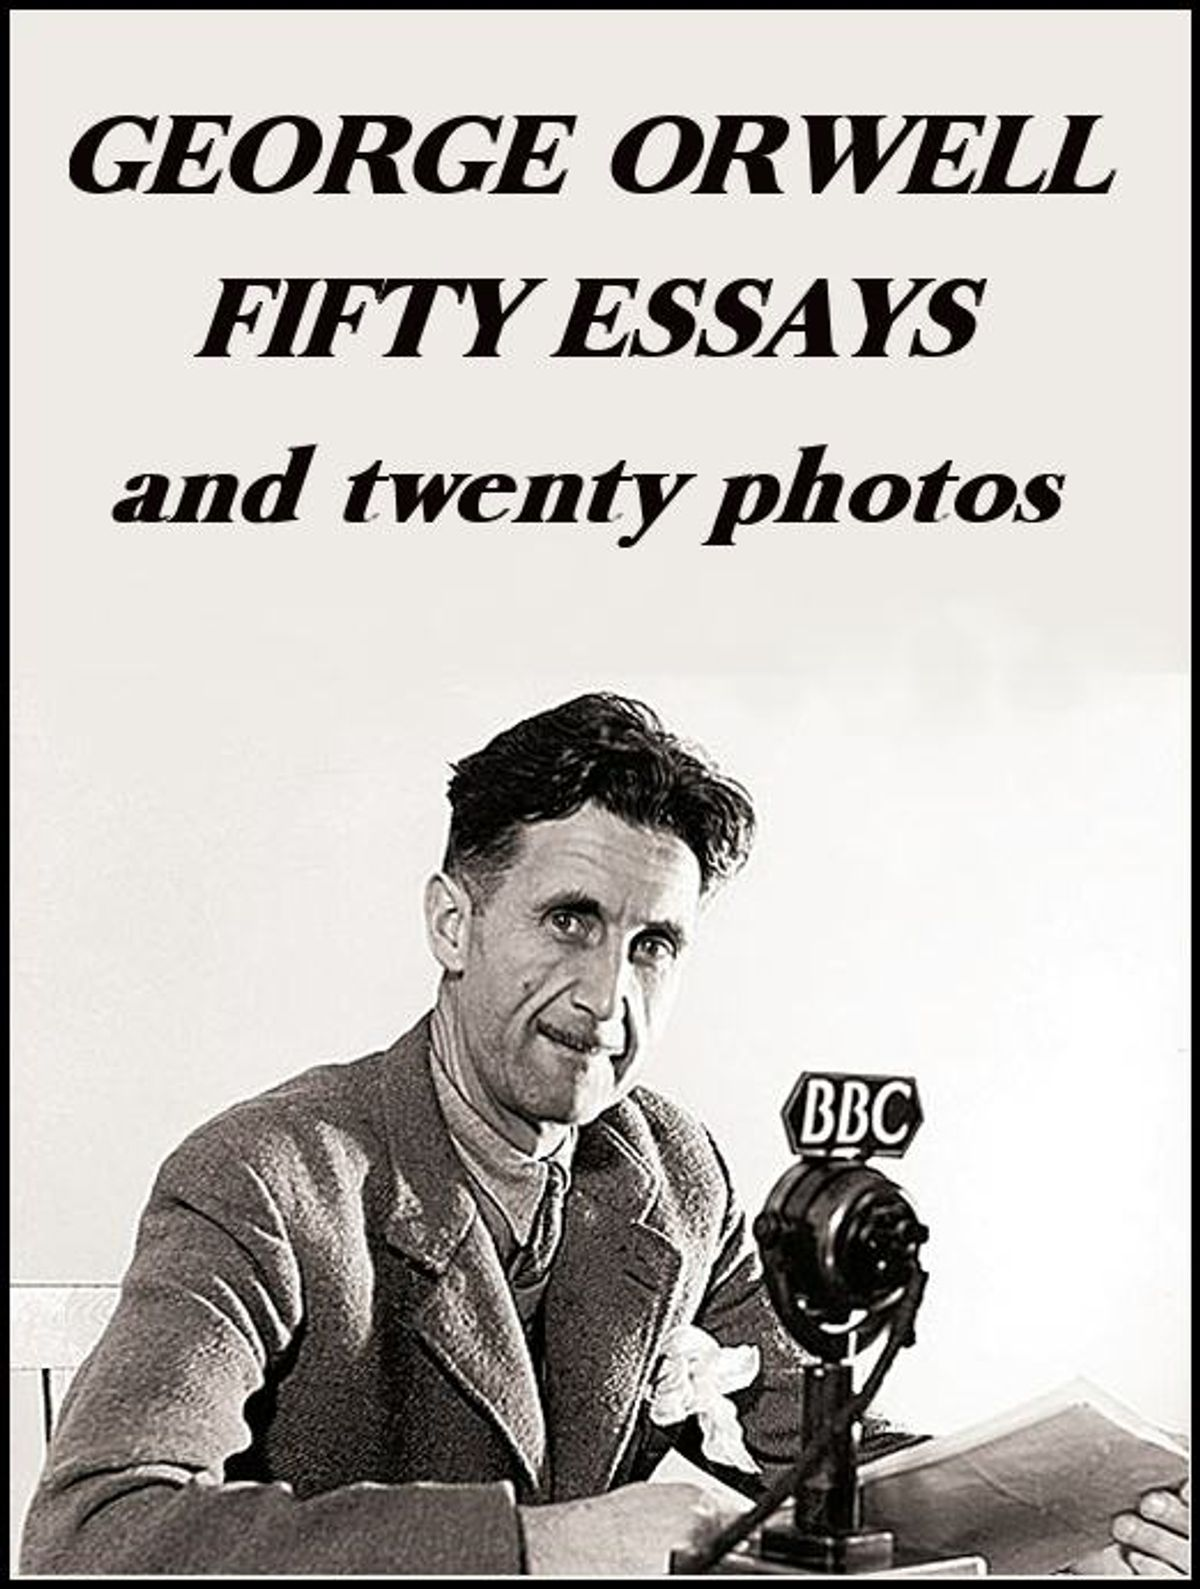 010 Essay Example George Orwell Fifty Frightening Essays Everyman's Library Summary Bookshop Memories Full